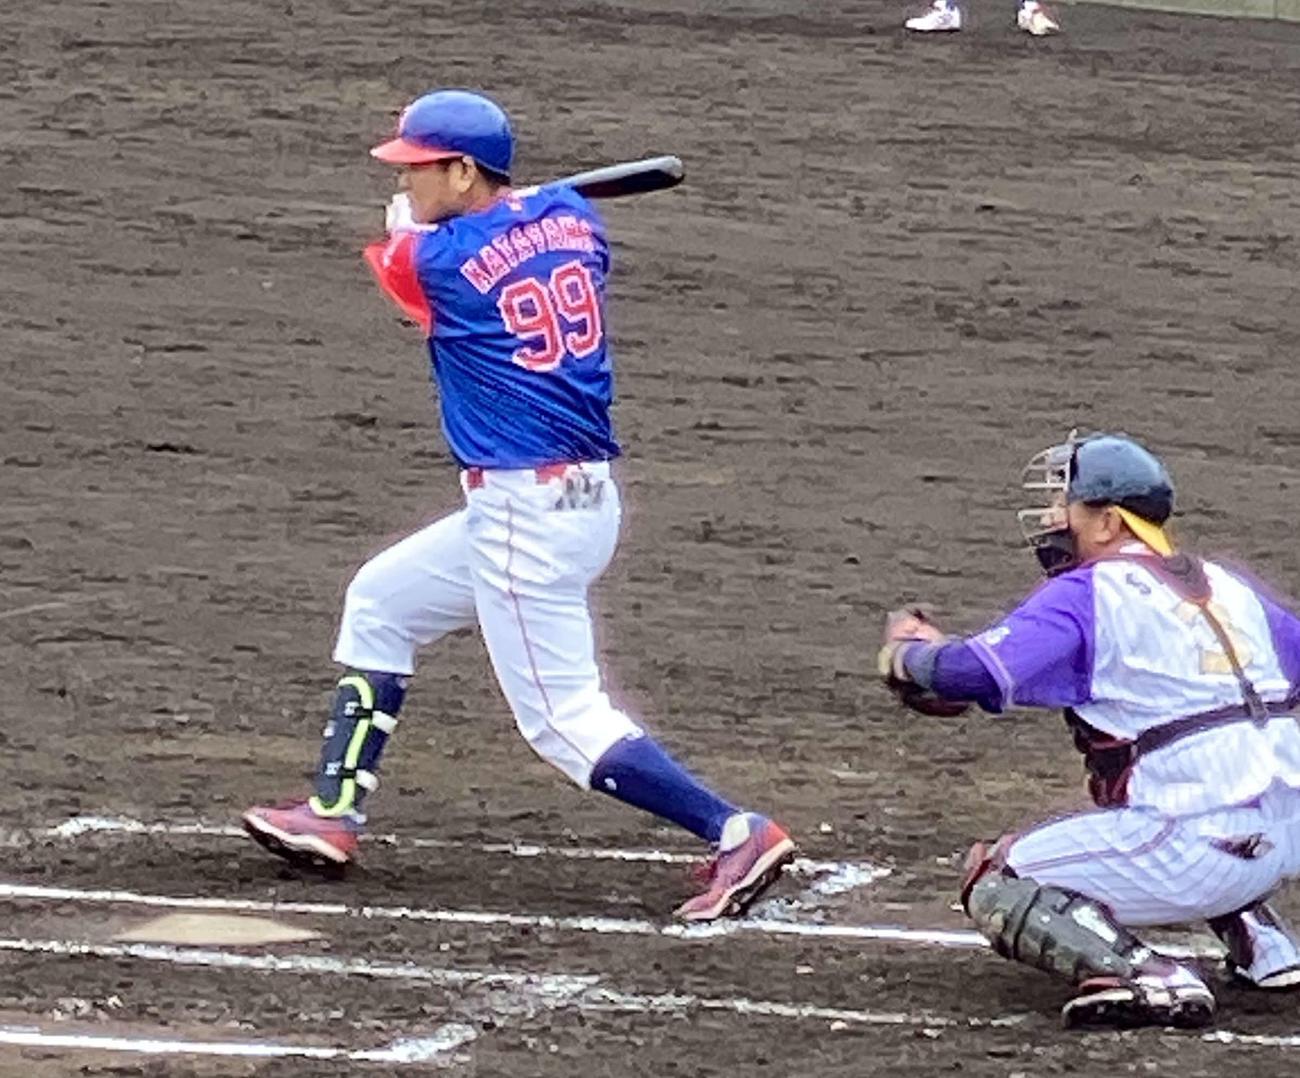 BC神奈川との練習試合で左前安打を放つBC武・蔵片山博視内野手兼ヘッドコーチ(撮影・湯本勝大)